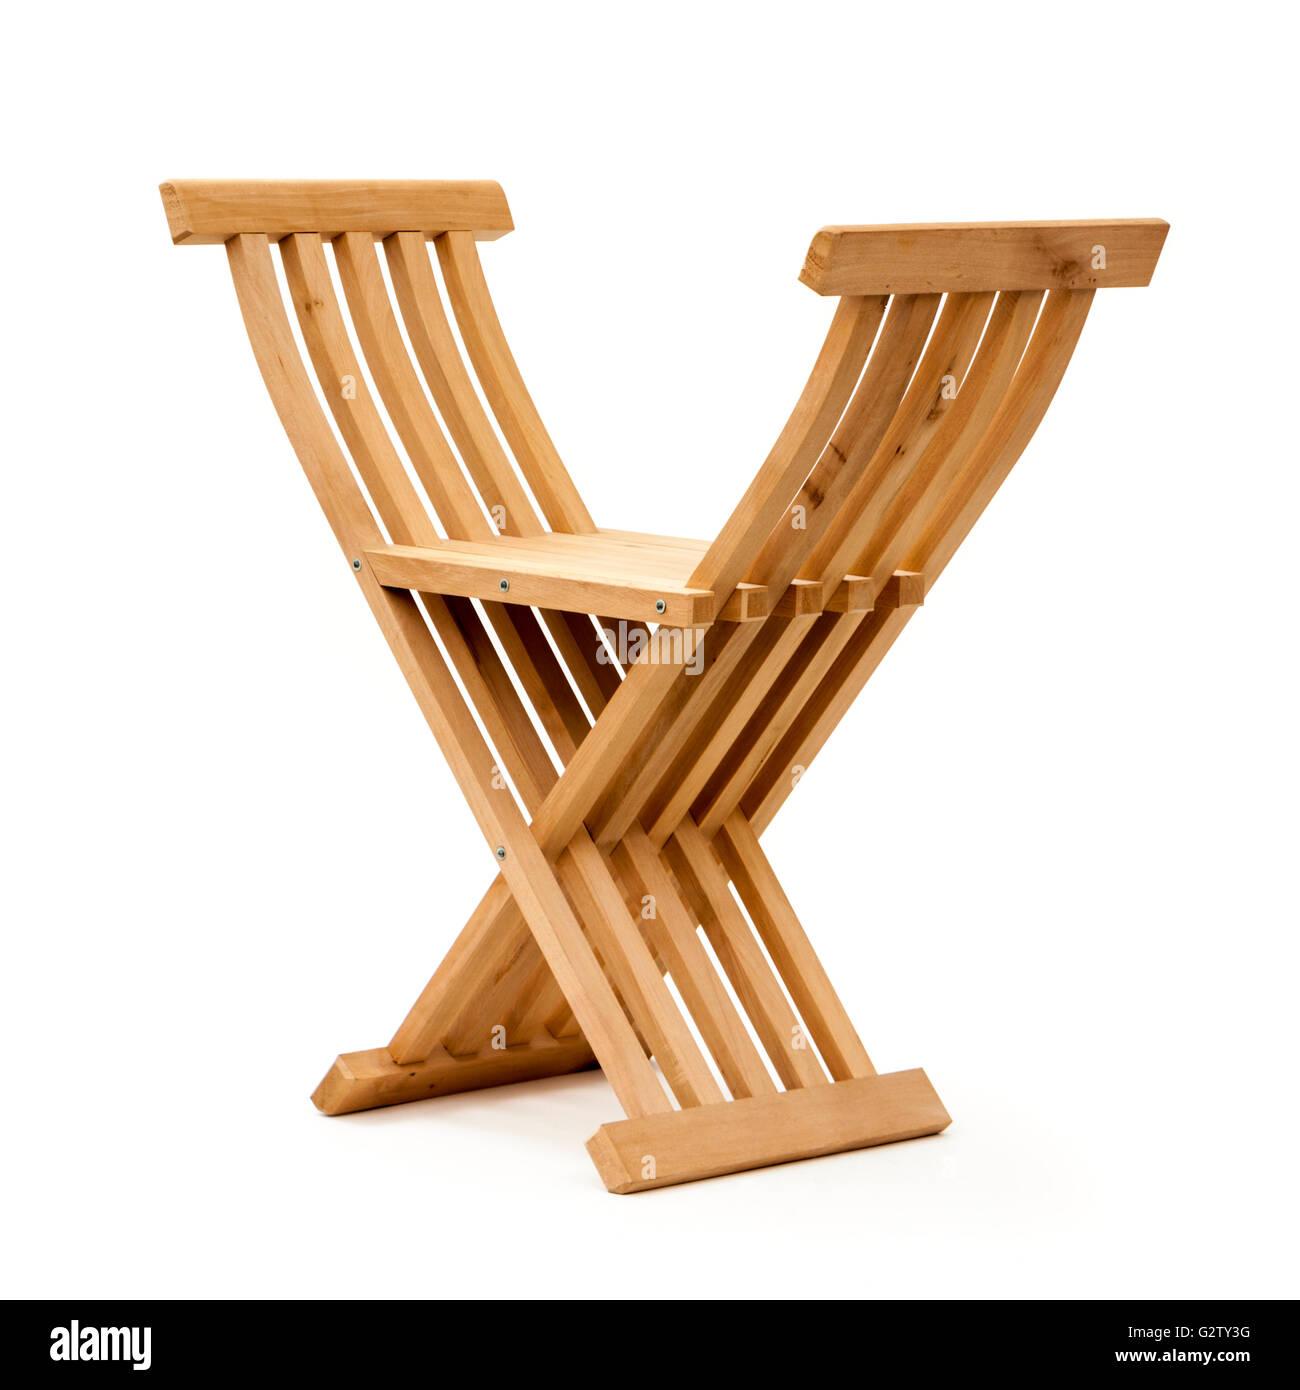 Modern Folding Wooden Space Saving Chair   Stock Image